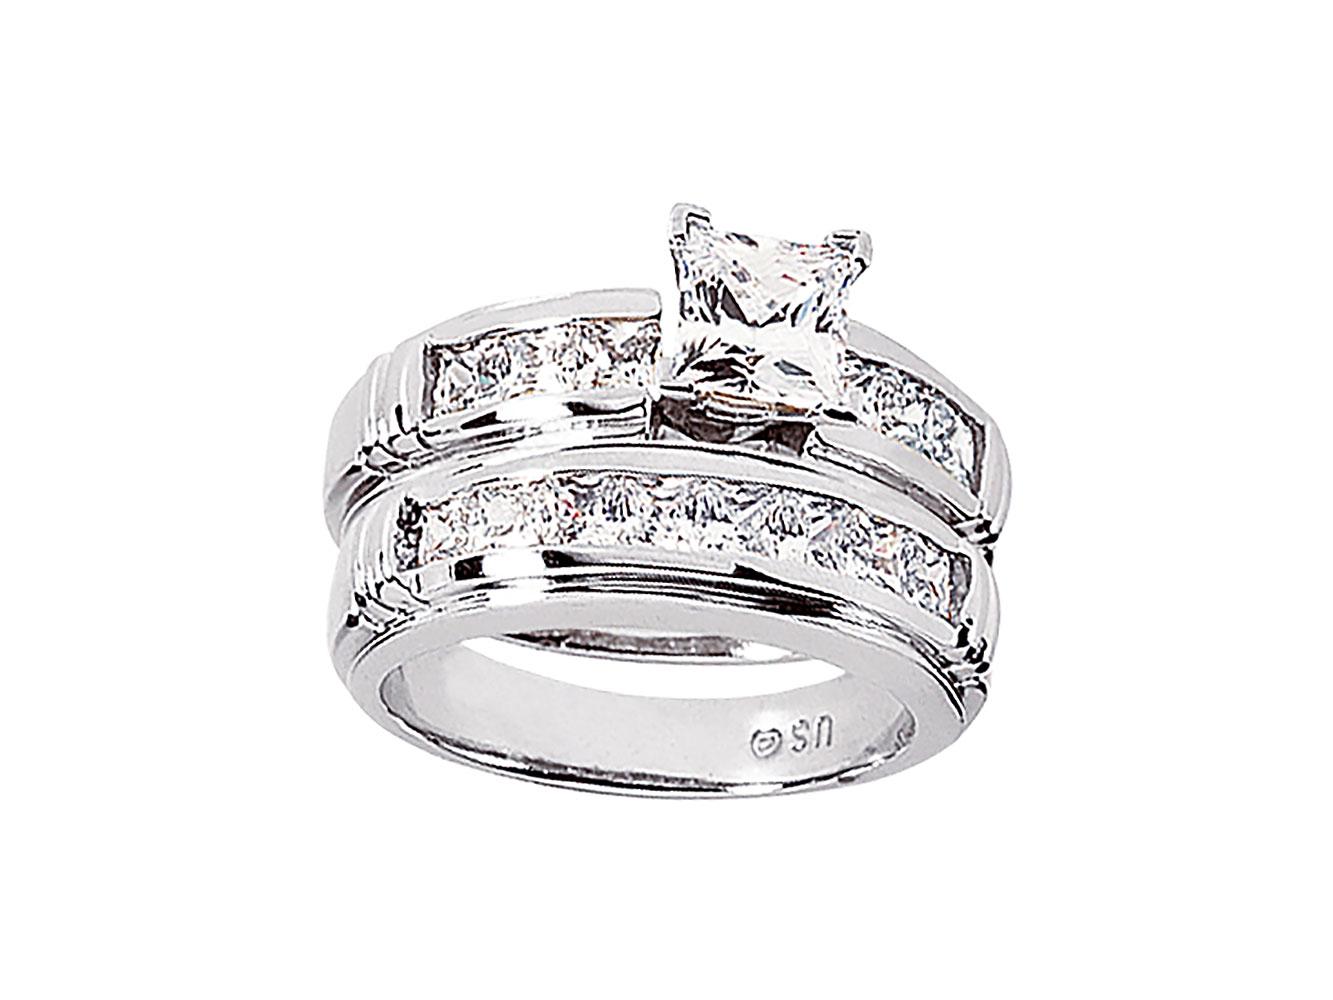 2 25ct princess engagement ring wedding band